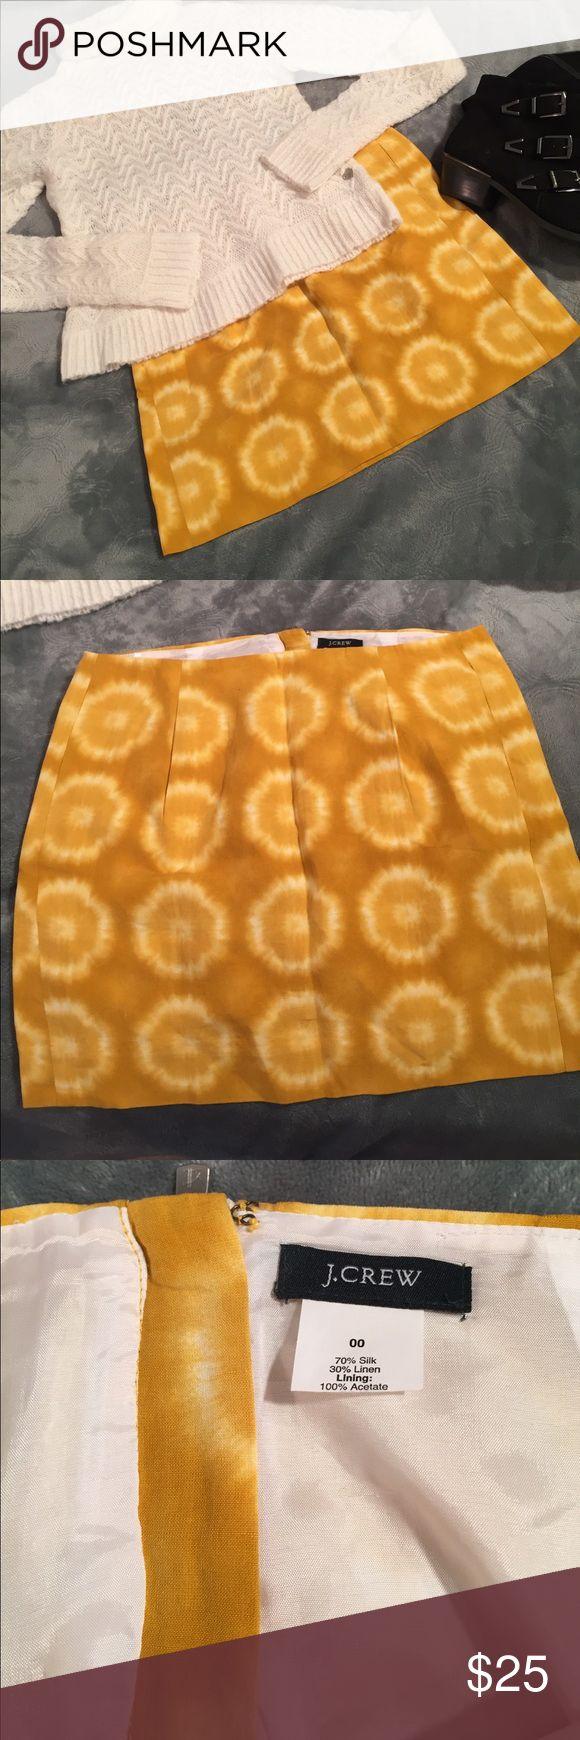 "J.crew yellow tie dye skirt 70% silk, 30% linen with exposed zipper back. Waist is 14"" across. Skirt is 14.5"" long. J. Crew Skirts Mini"